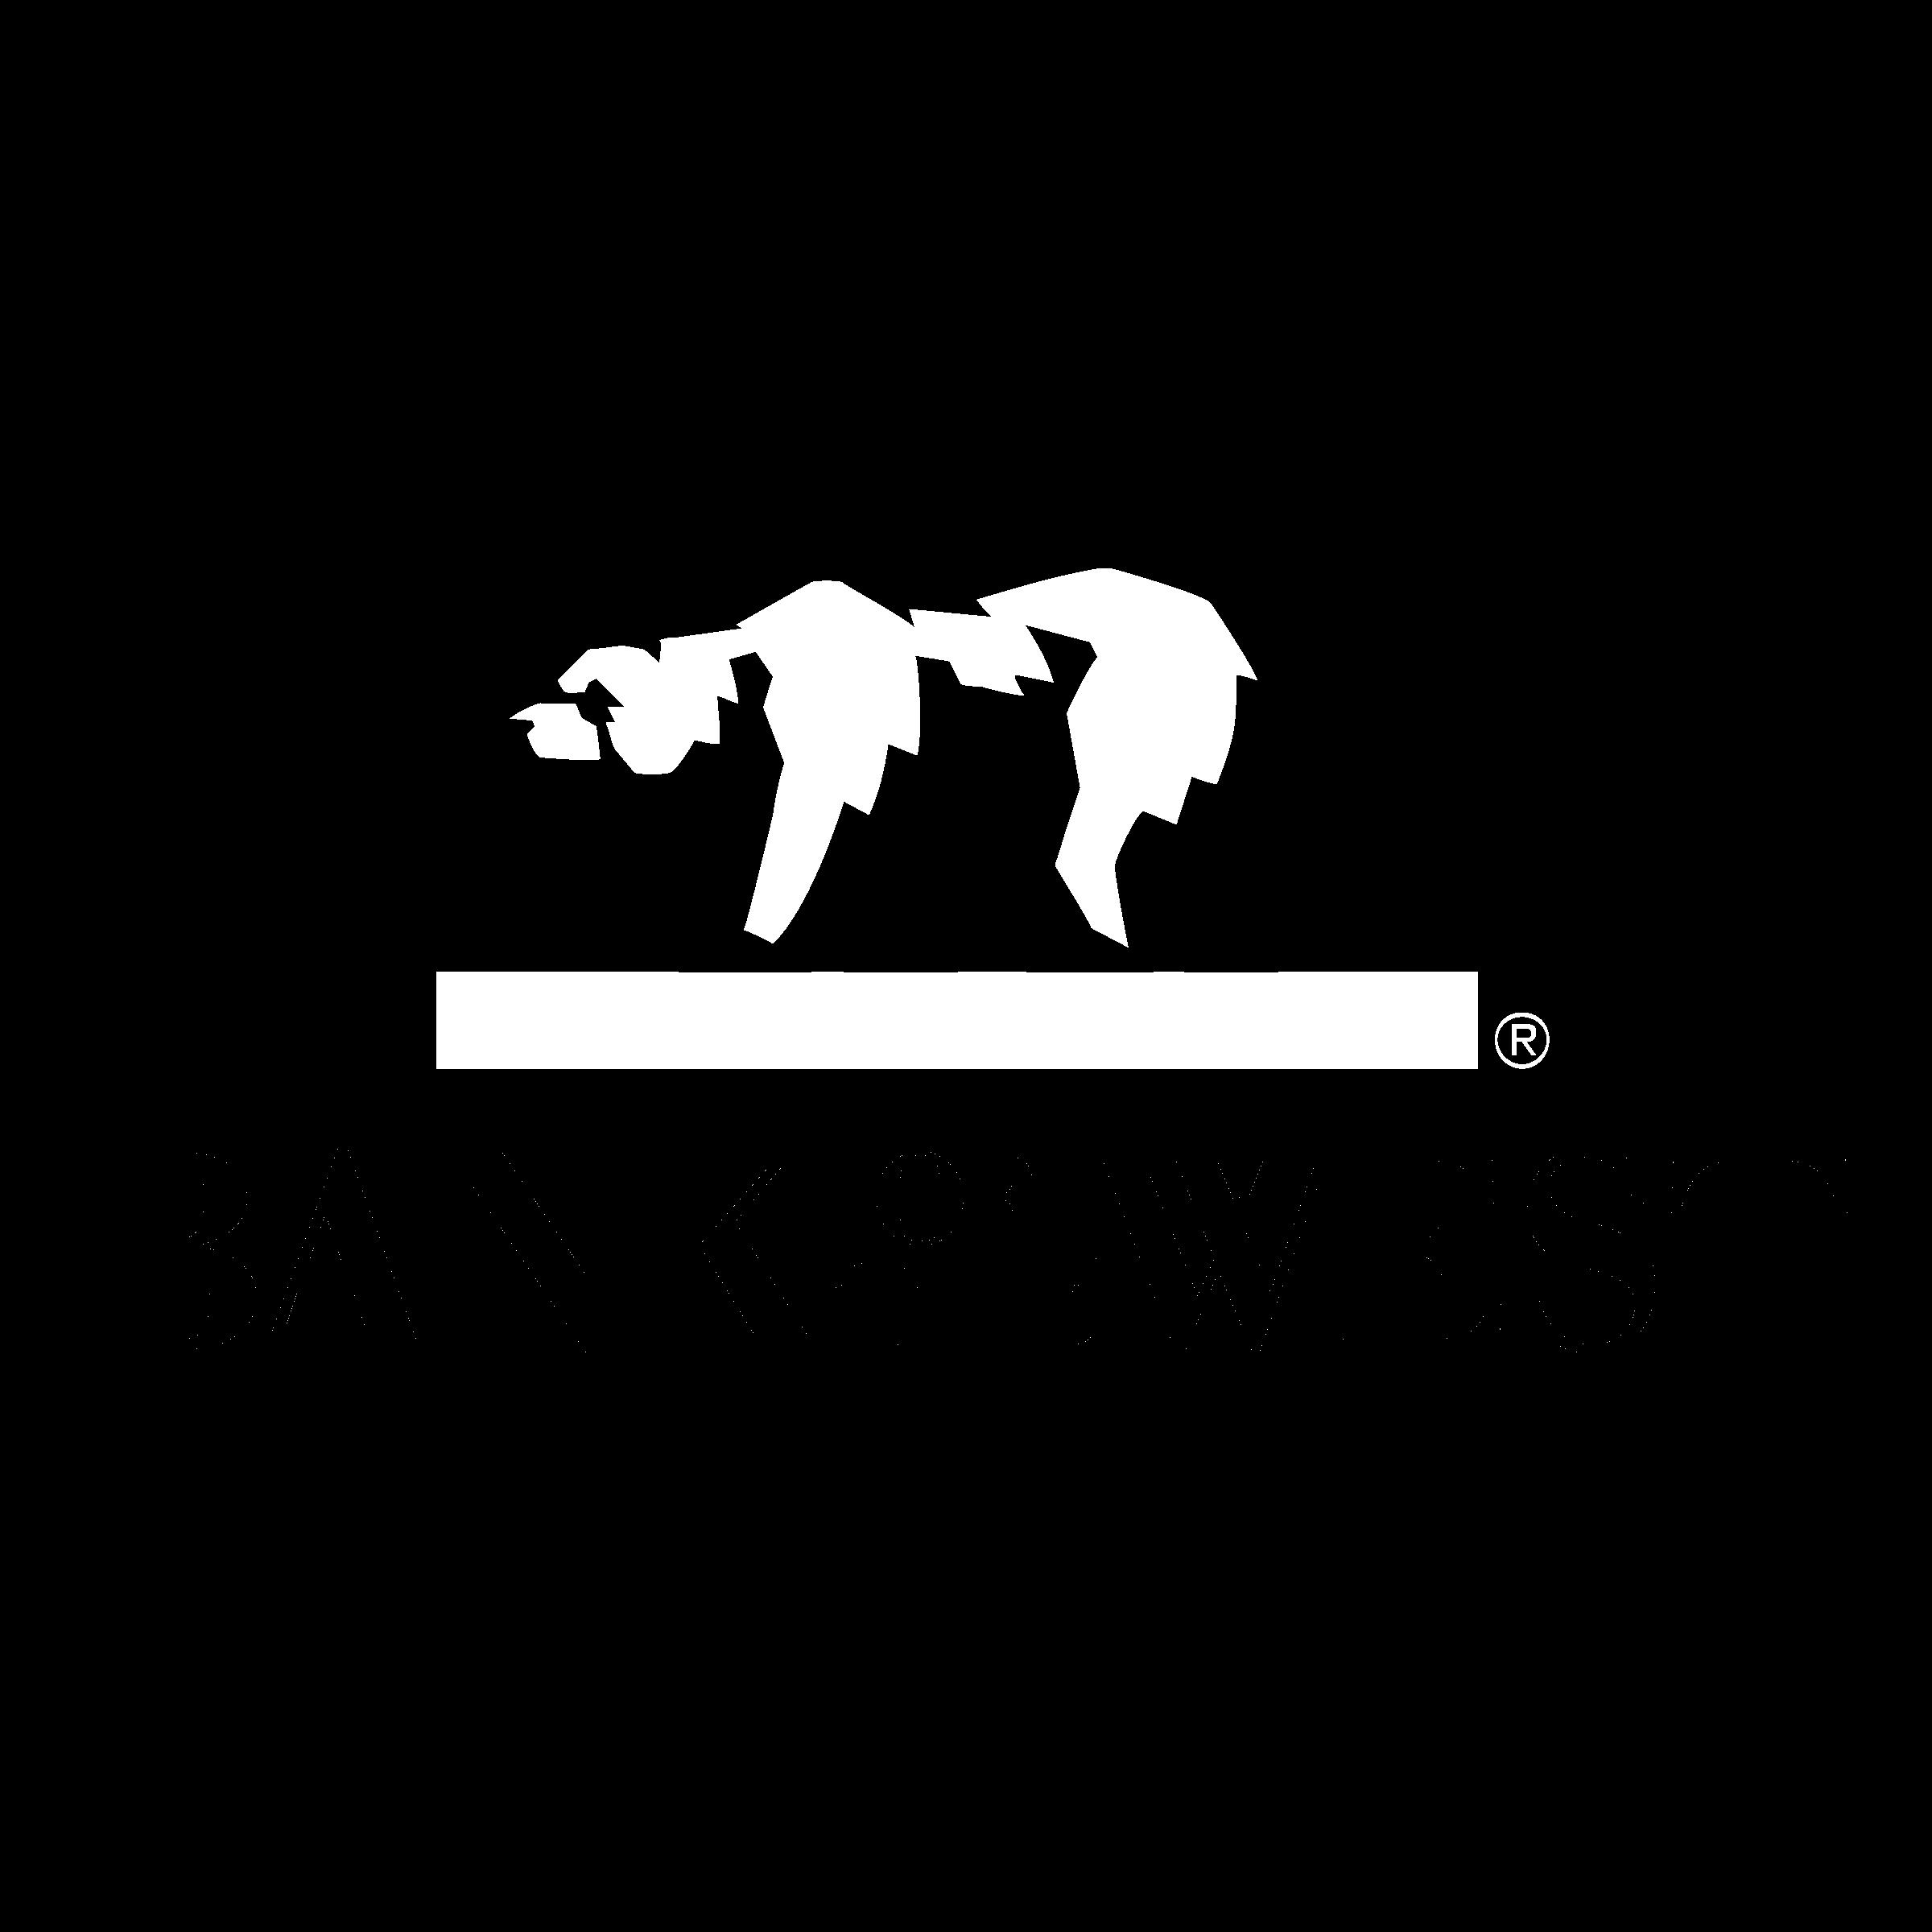 Bank of the West 01 Logo PNG Transparent & SVG Vector.